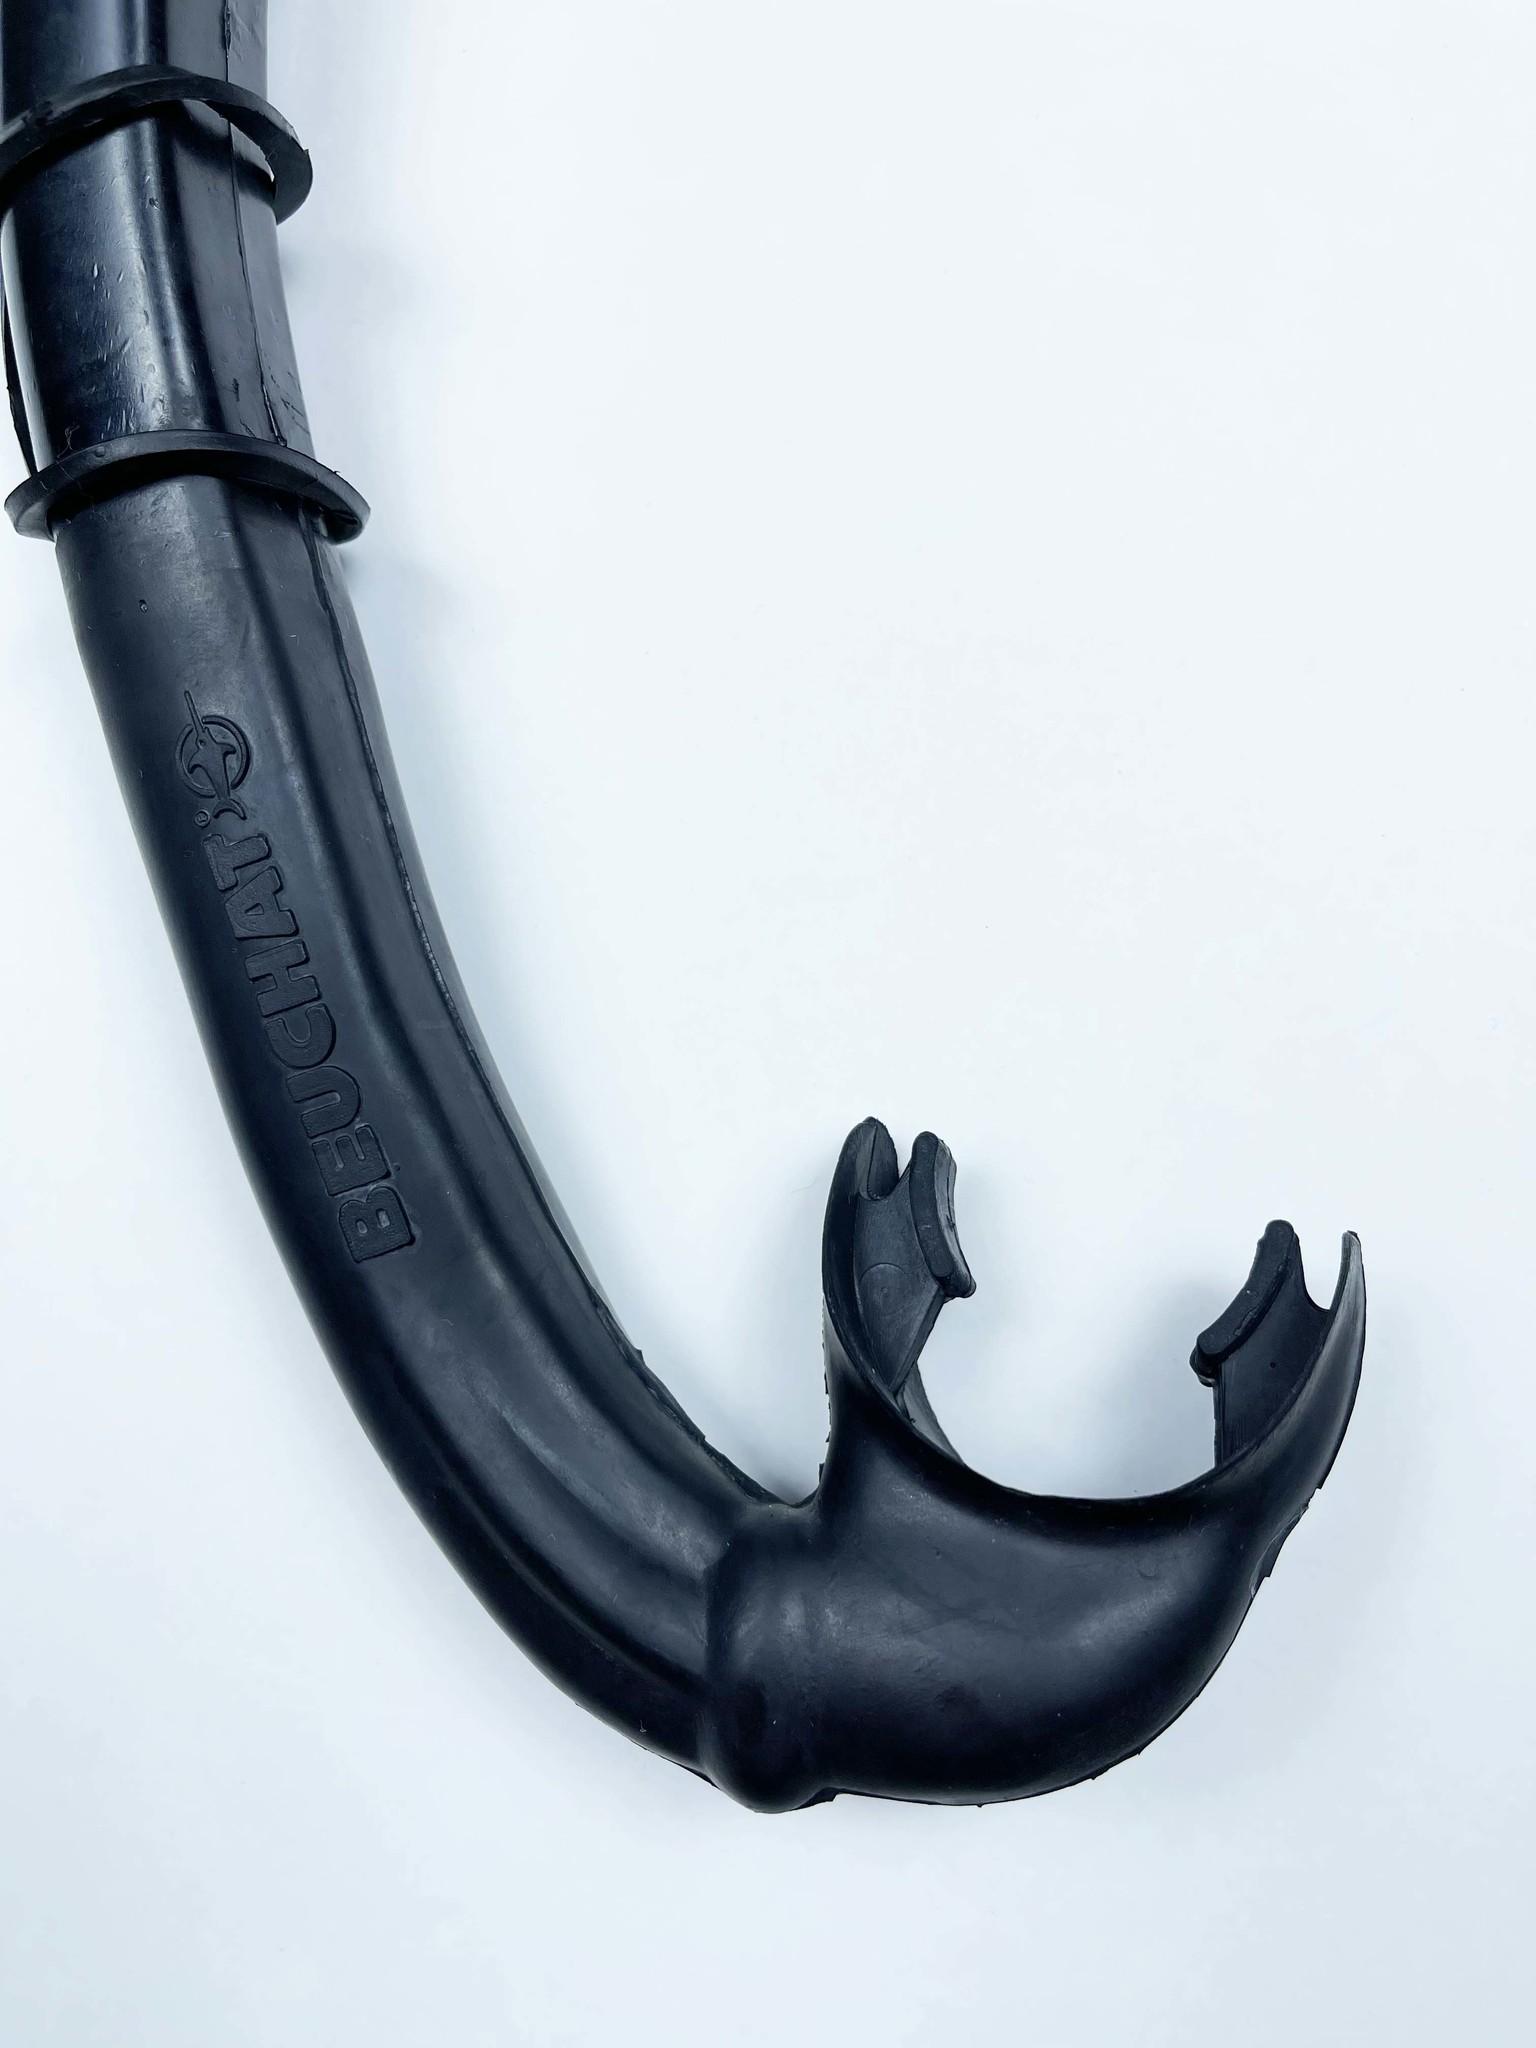 Трубка Beuchat Tubair